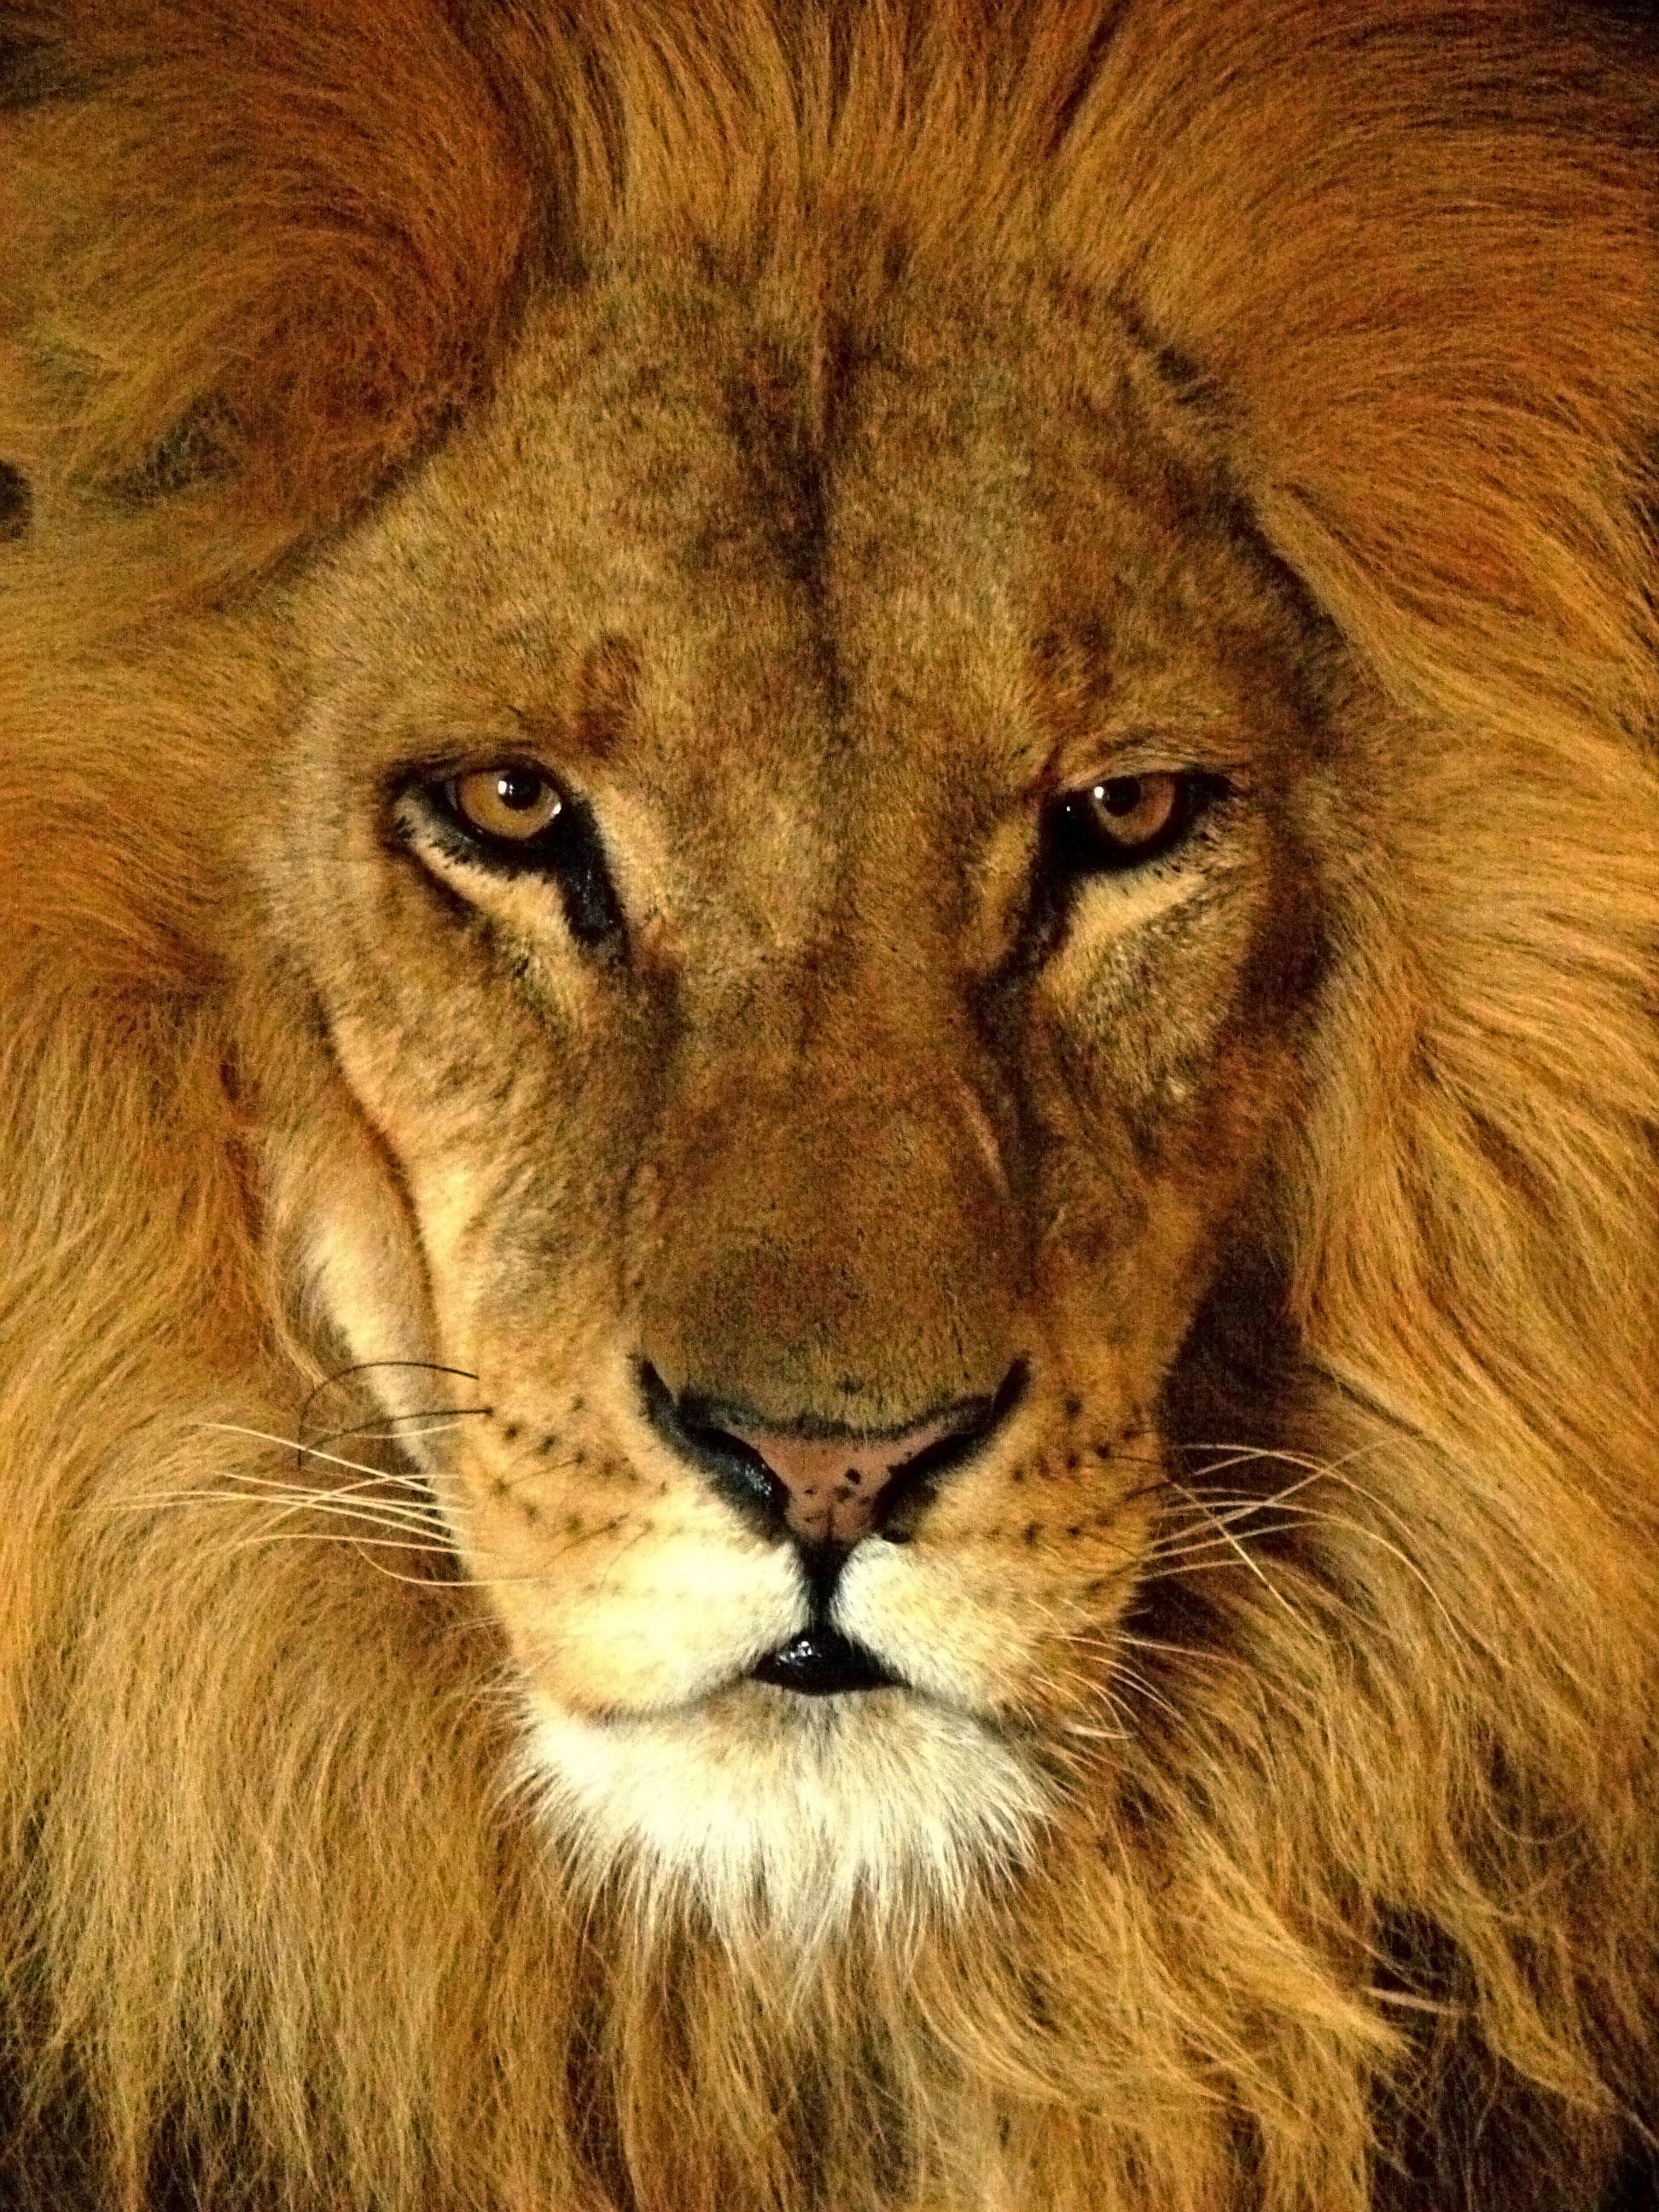 Lion head - photo#16